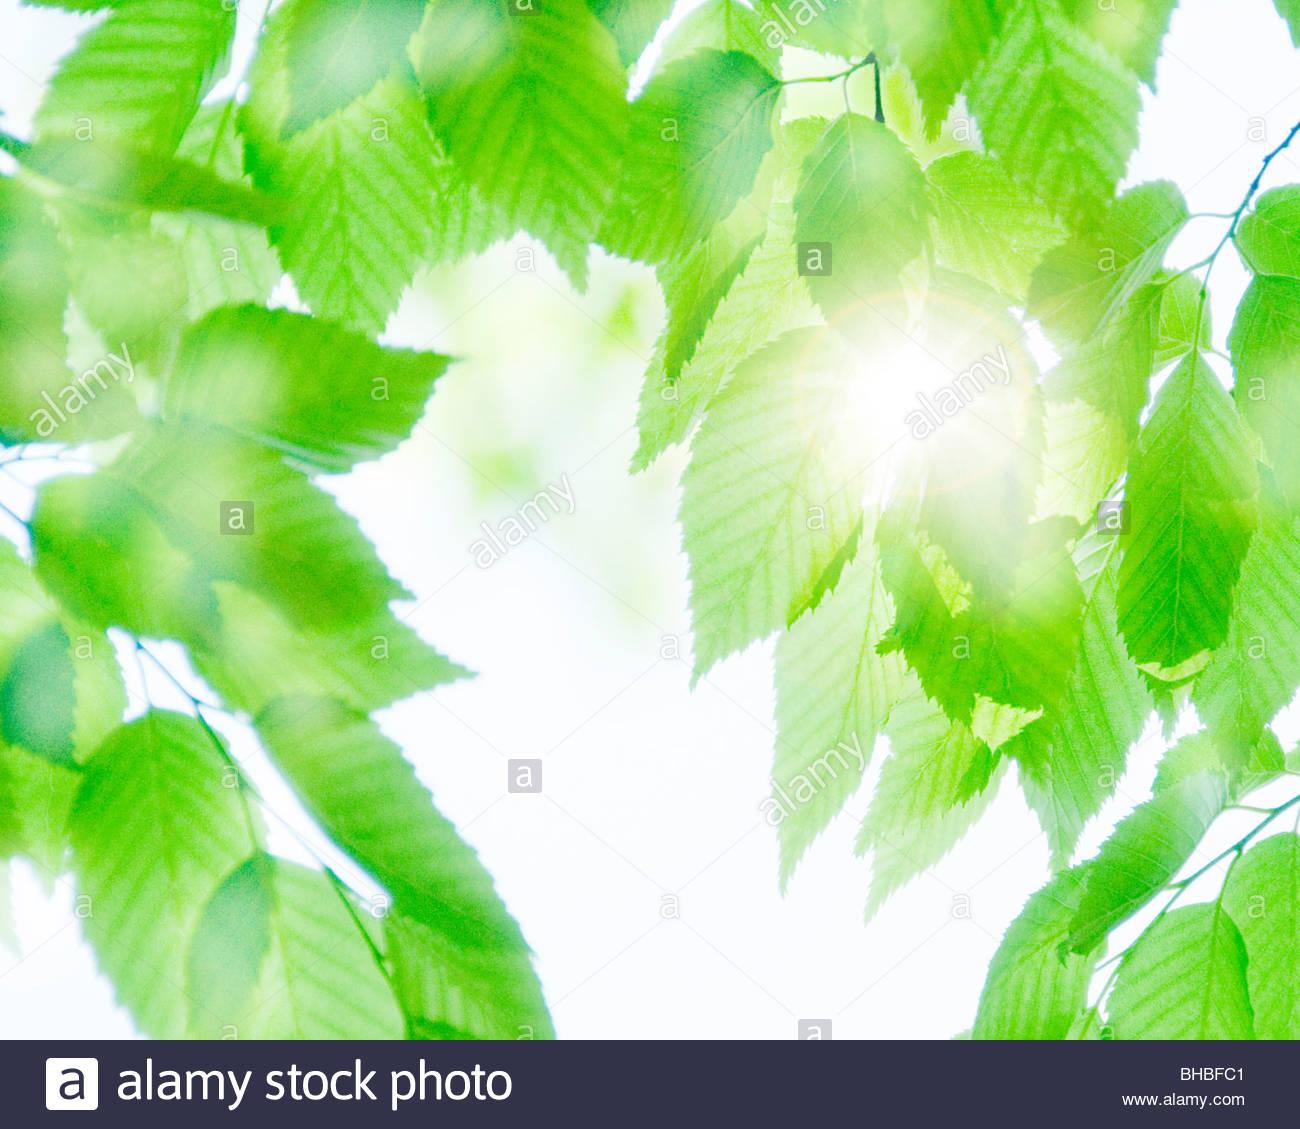 Sunlight Falling On Fresh Green Leaves Stock Photo, Royalty Free.